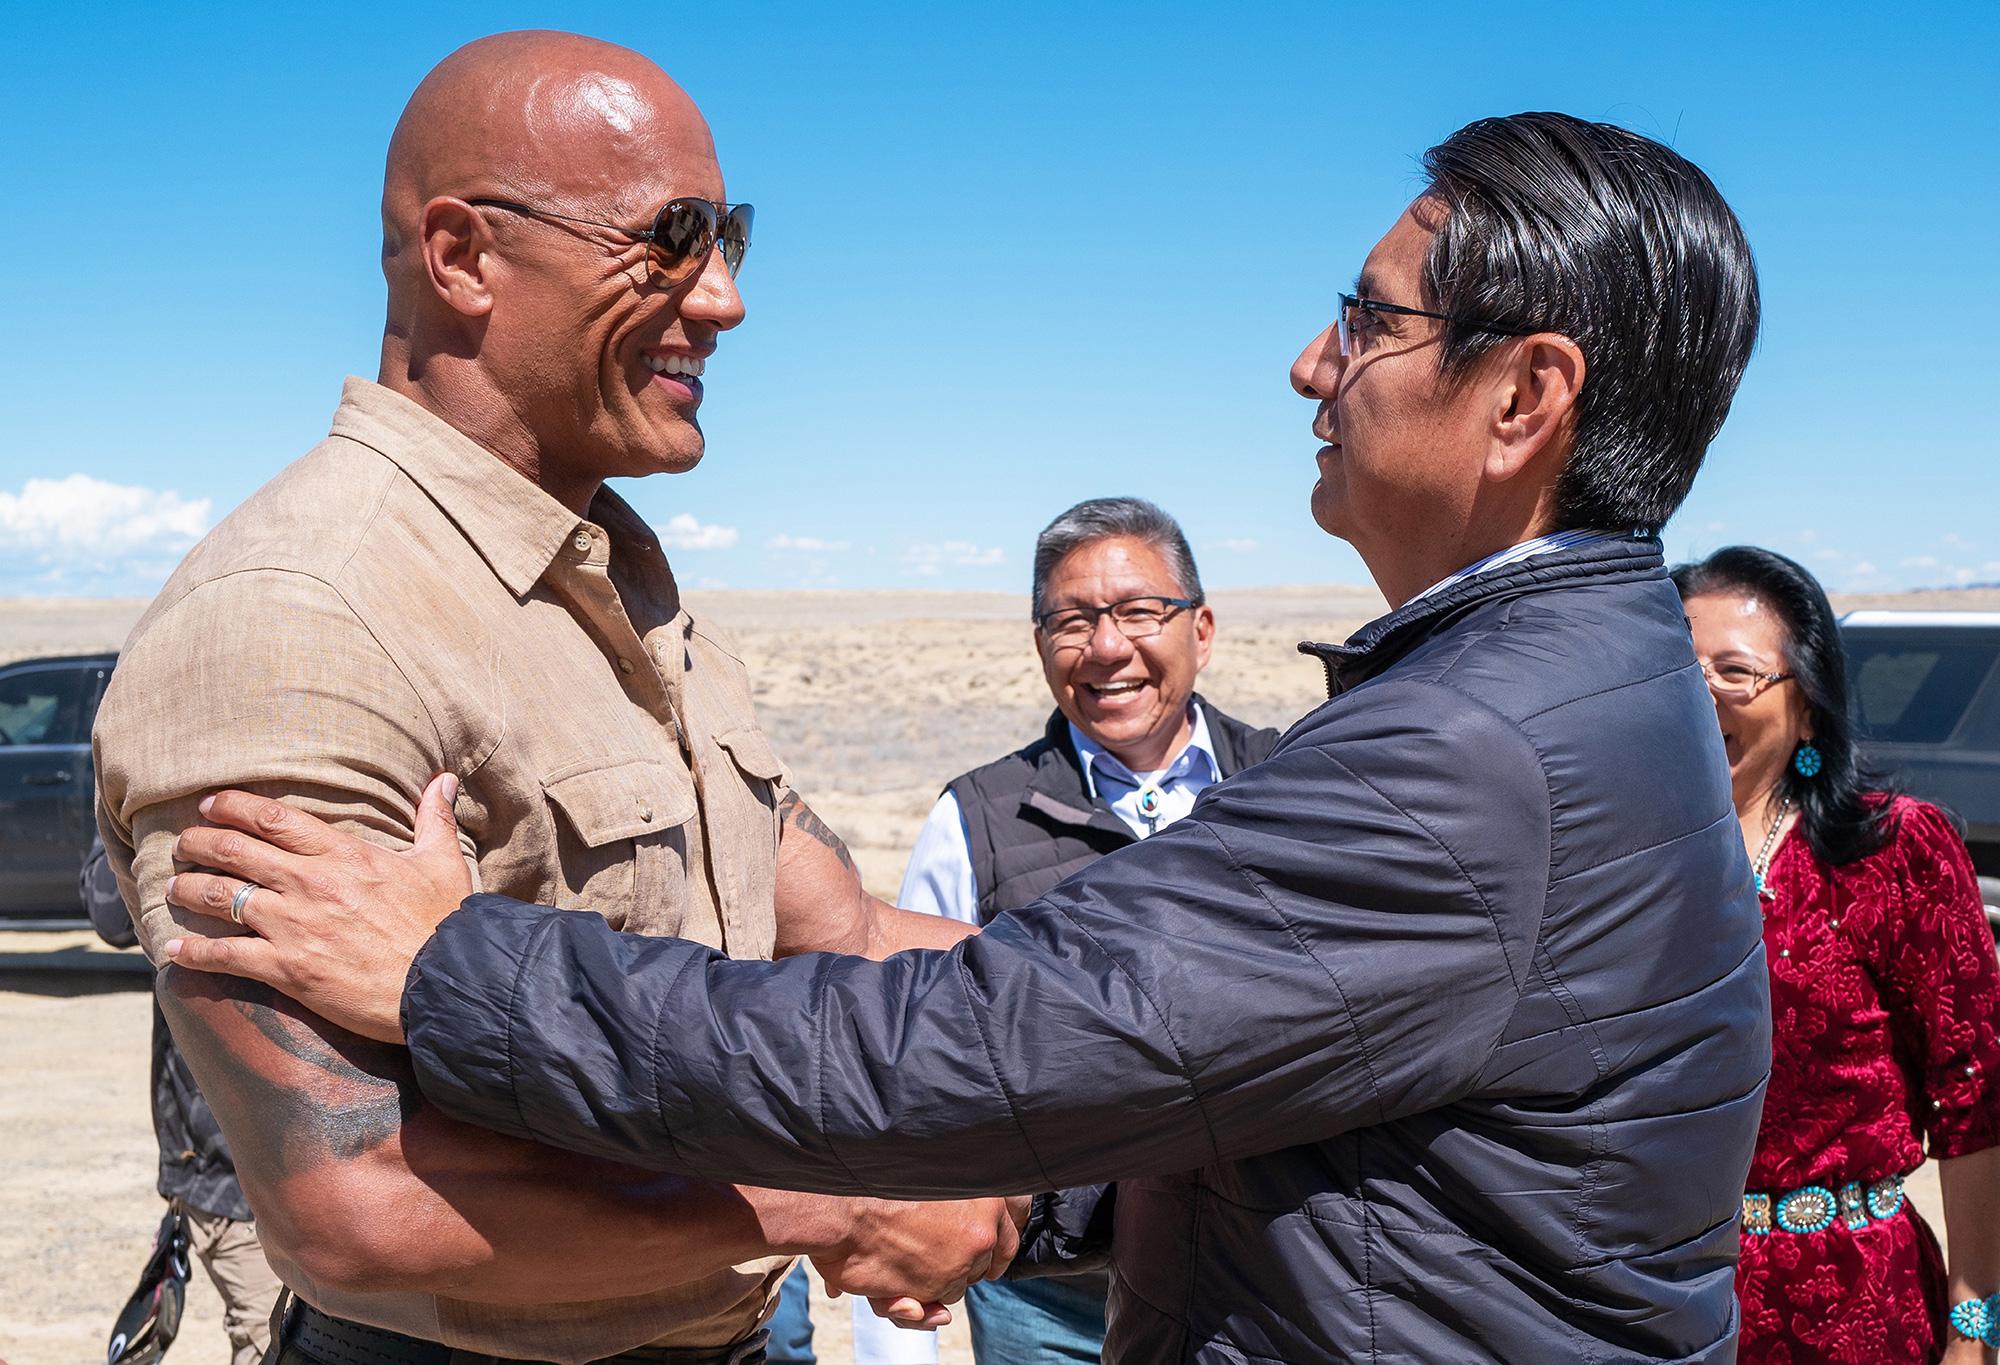 That's a wrap: Jumanji 3 films on Navajo Nation | Navajo ...